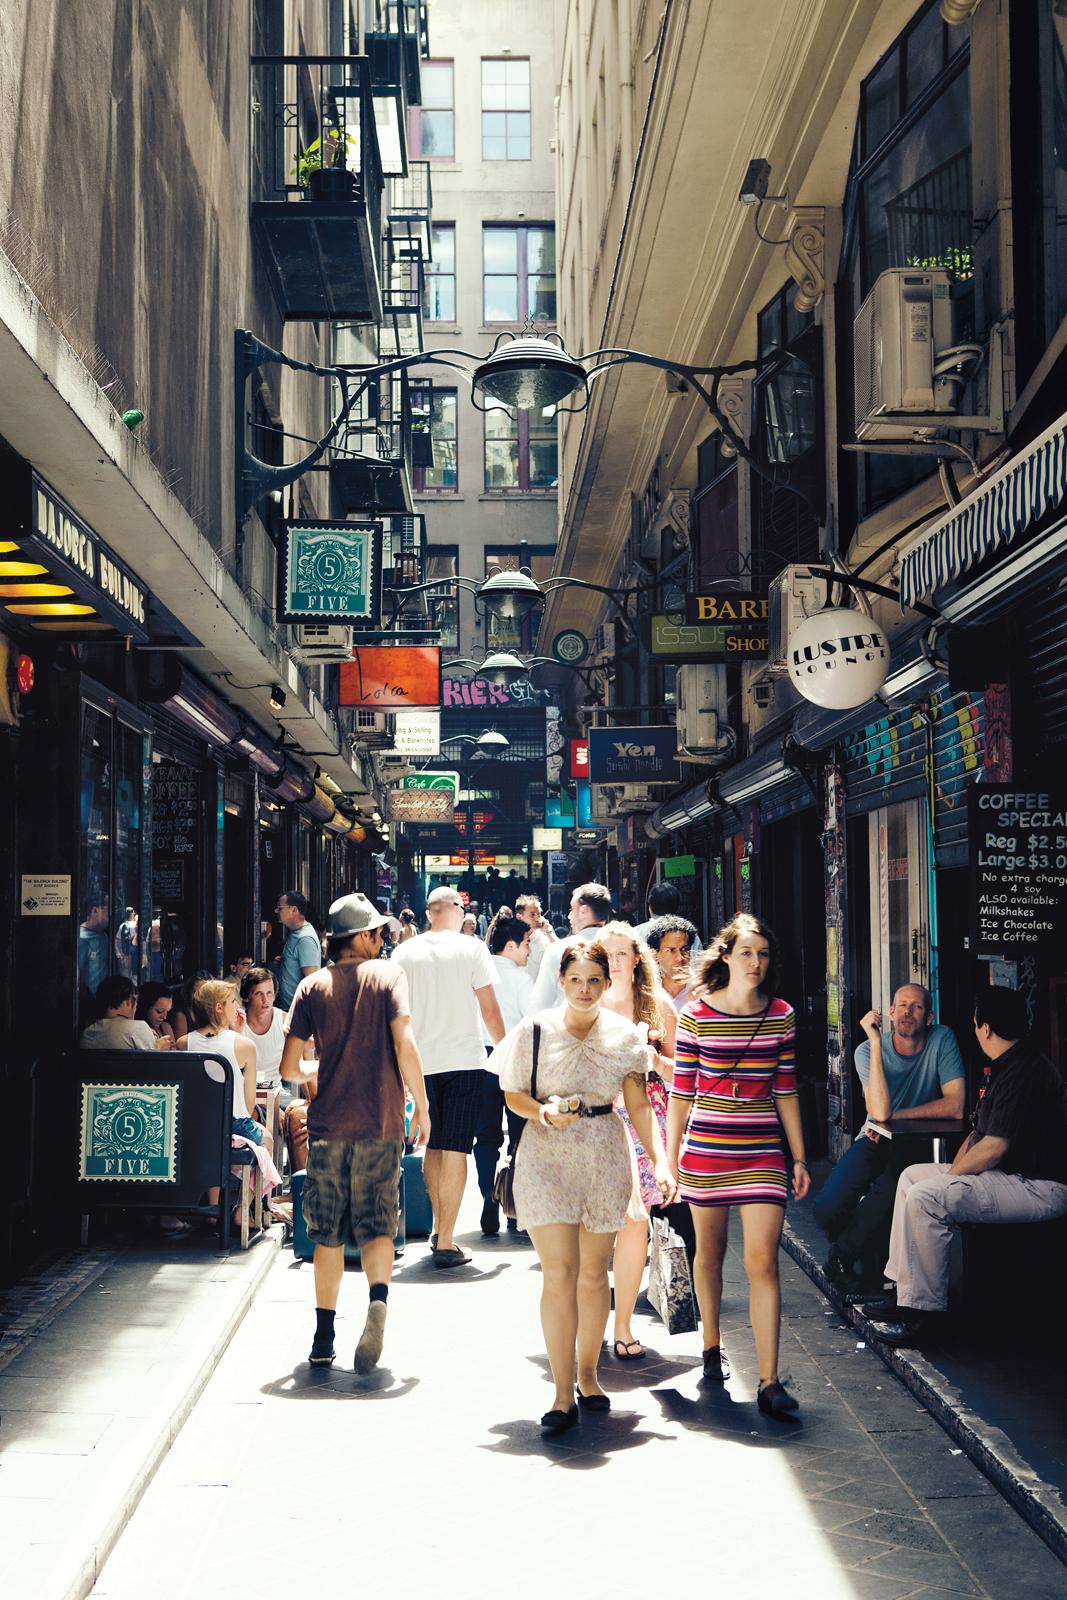 Central Business District in Melbourne, Australia